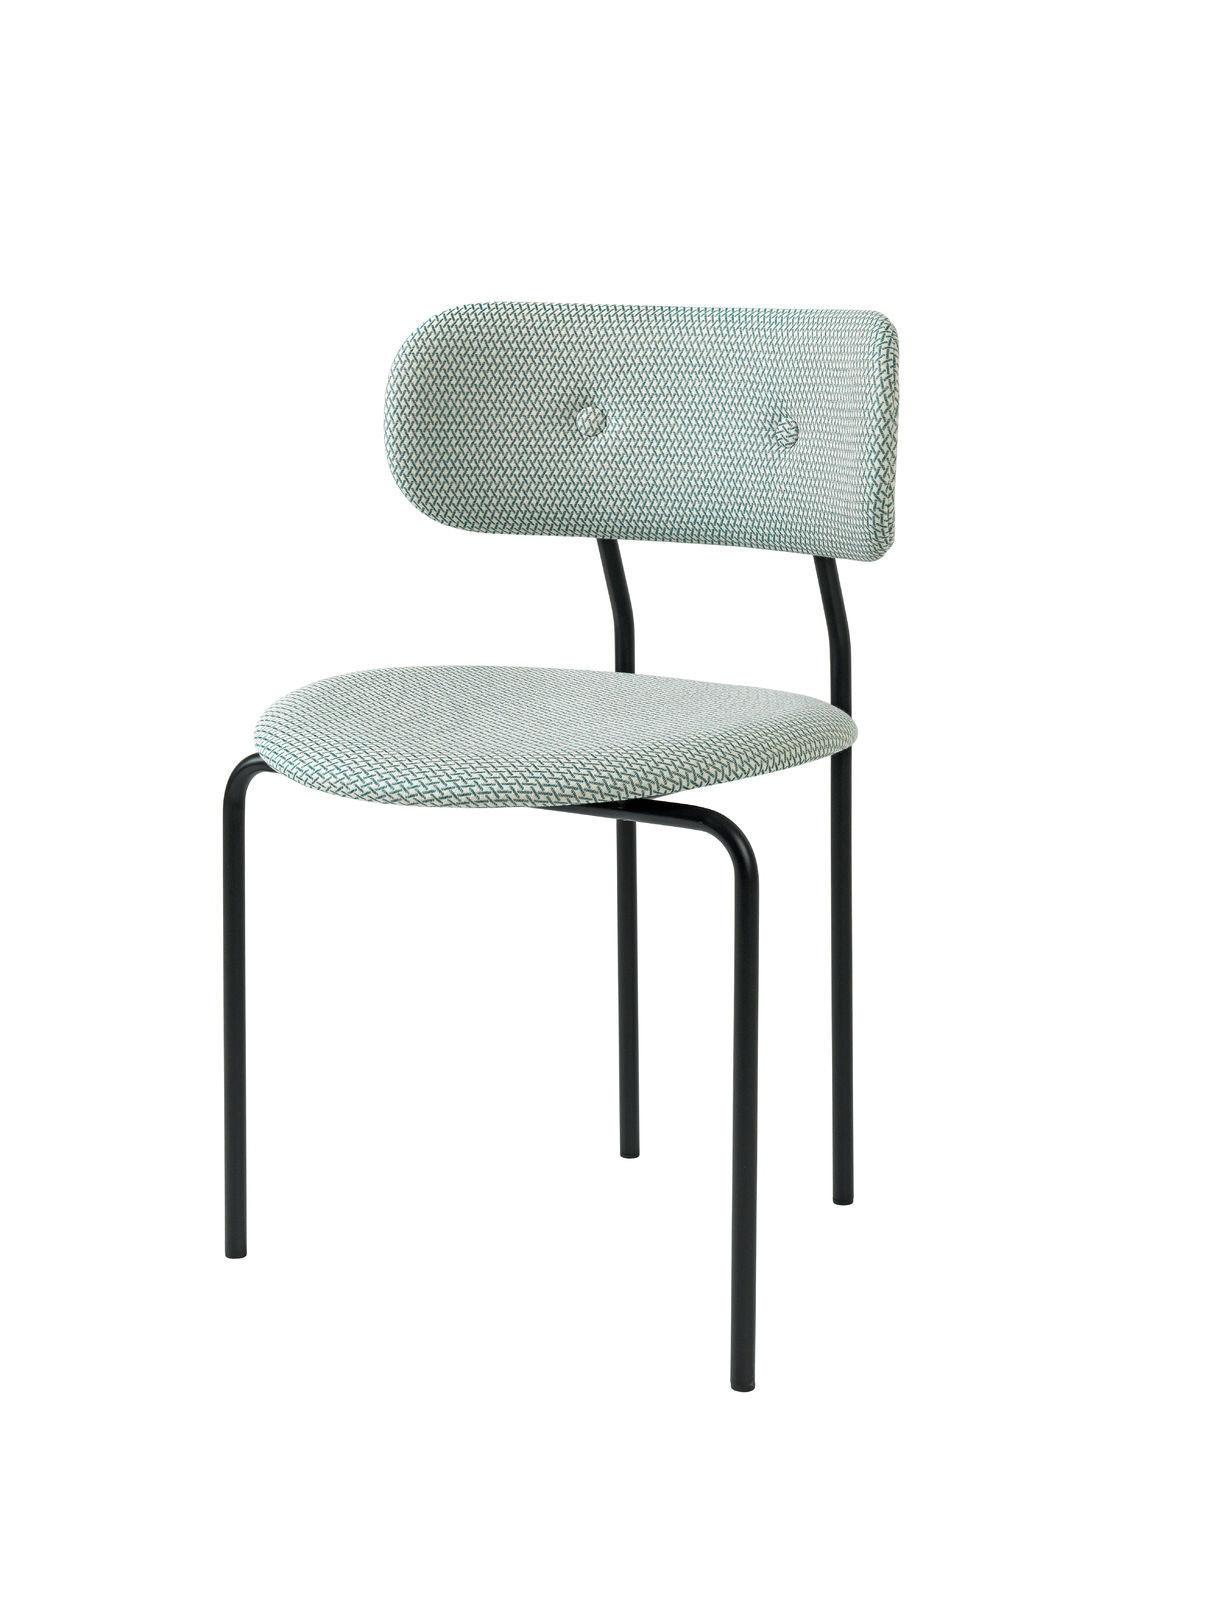 Coco Chair Black Backhausen Korb Mc741 D35 Front 1600X1600